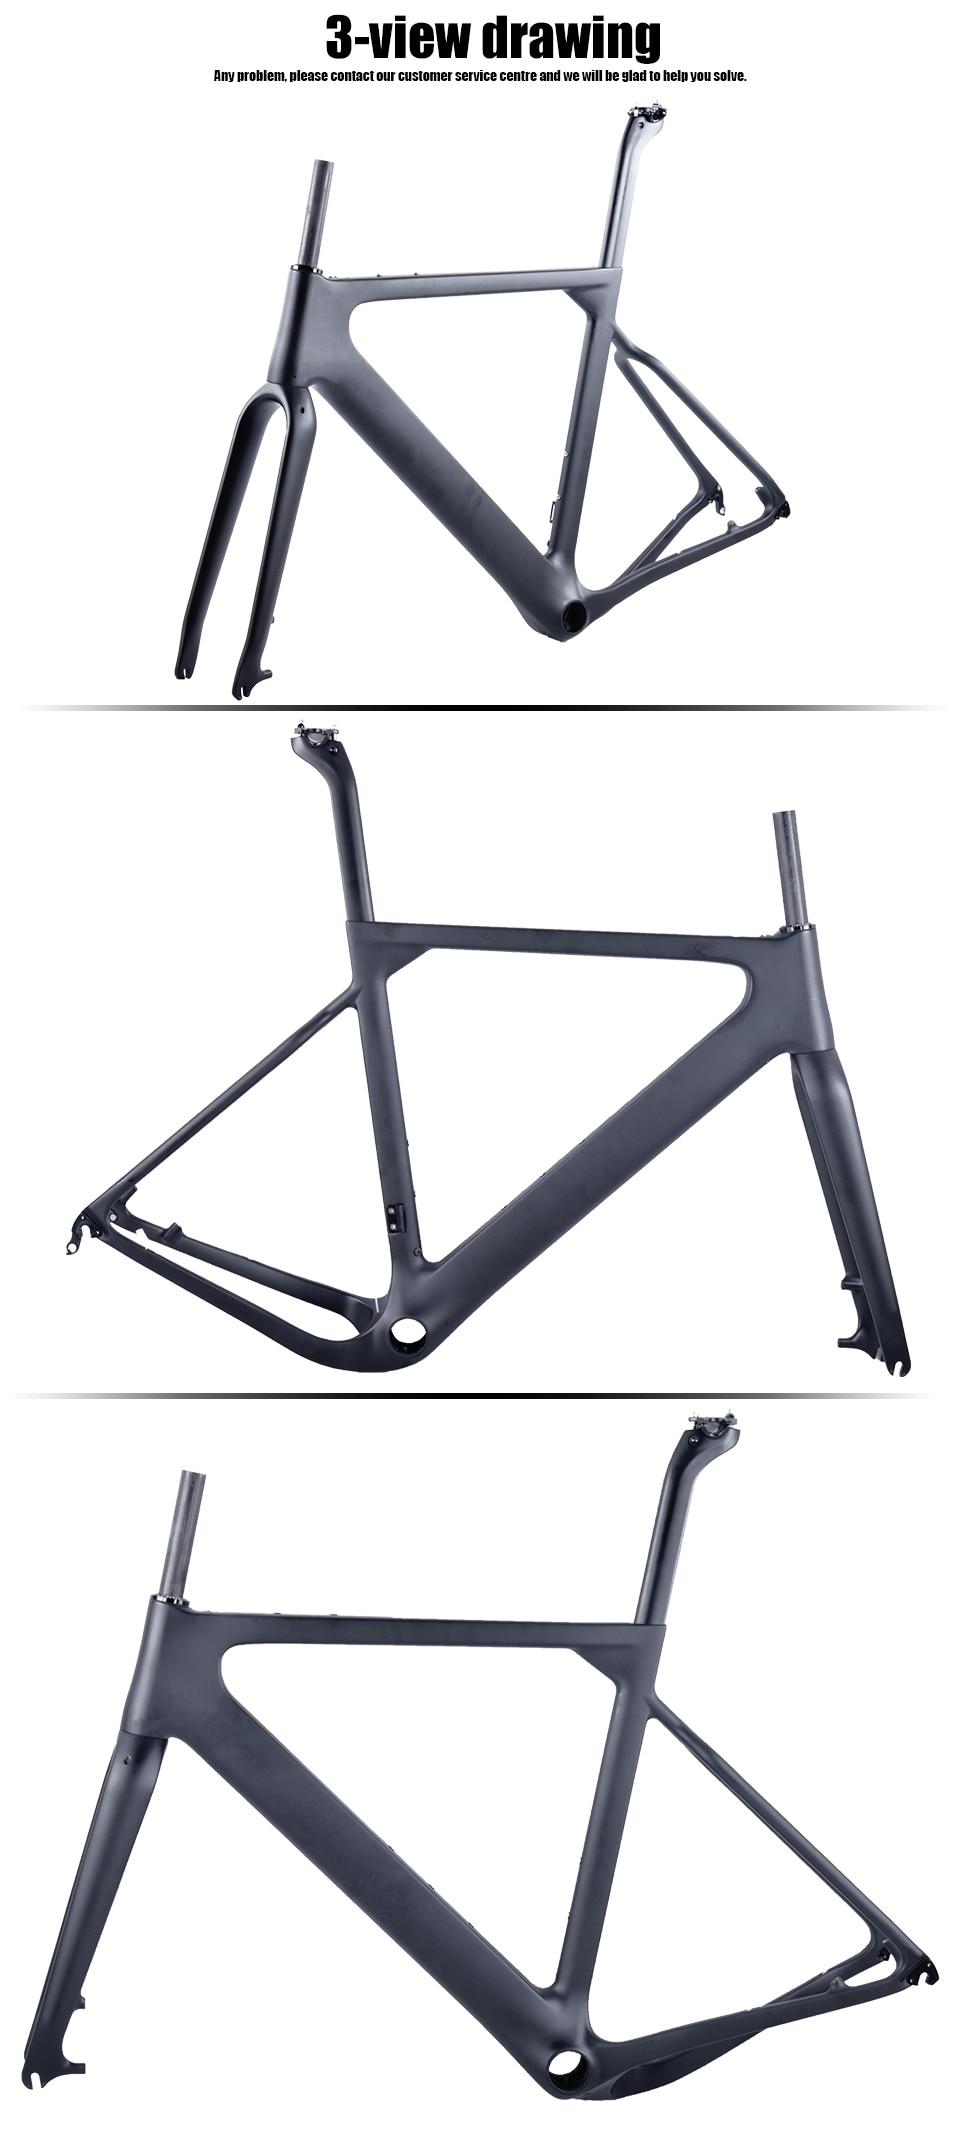 HTB17CtQB5CYBuNkSnaVq6AMsVXa3 - 2018 New Cyclocross Frame Aero Road or Gravel Bike Frame S/M/L size Disc Bike Carbon frameset QR or thru axle